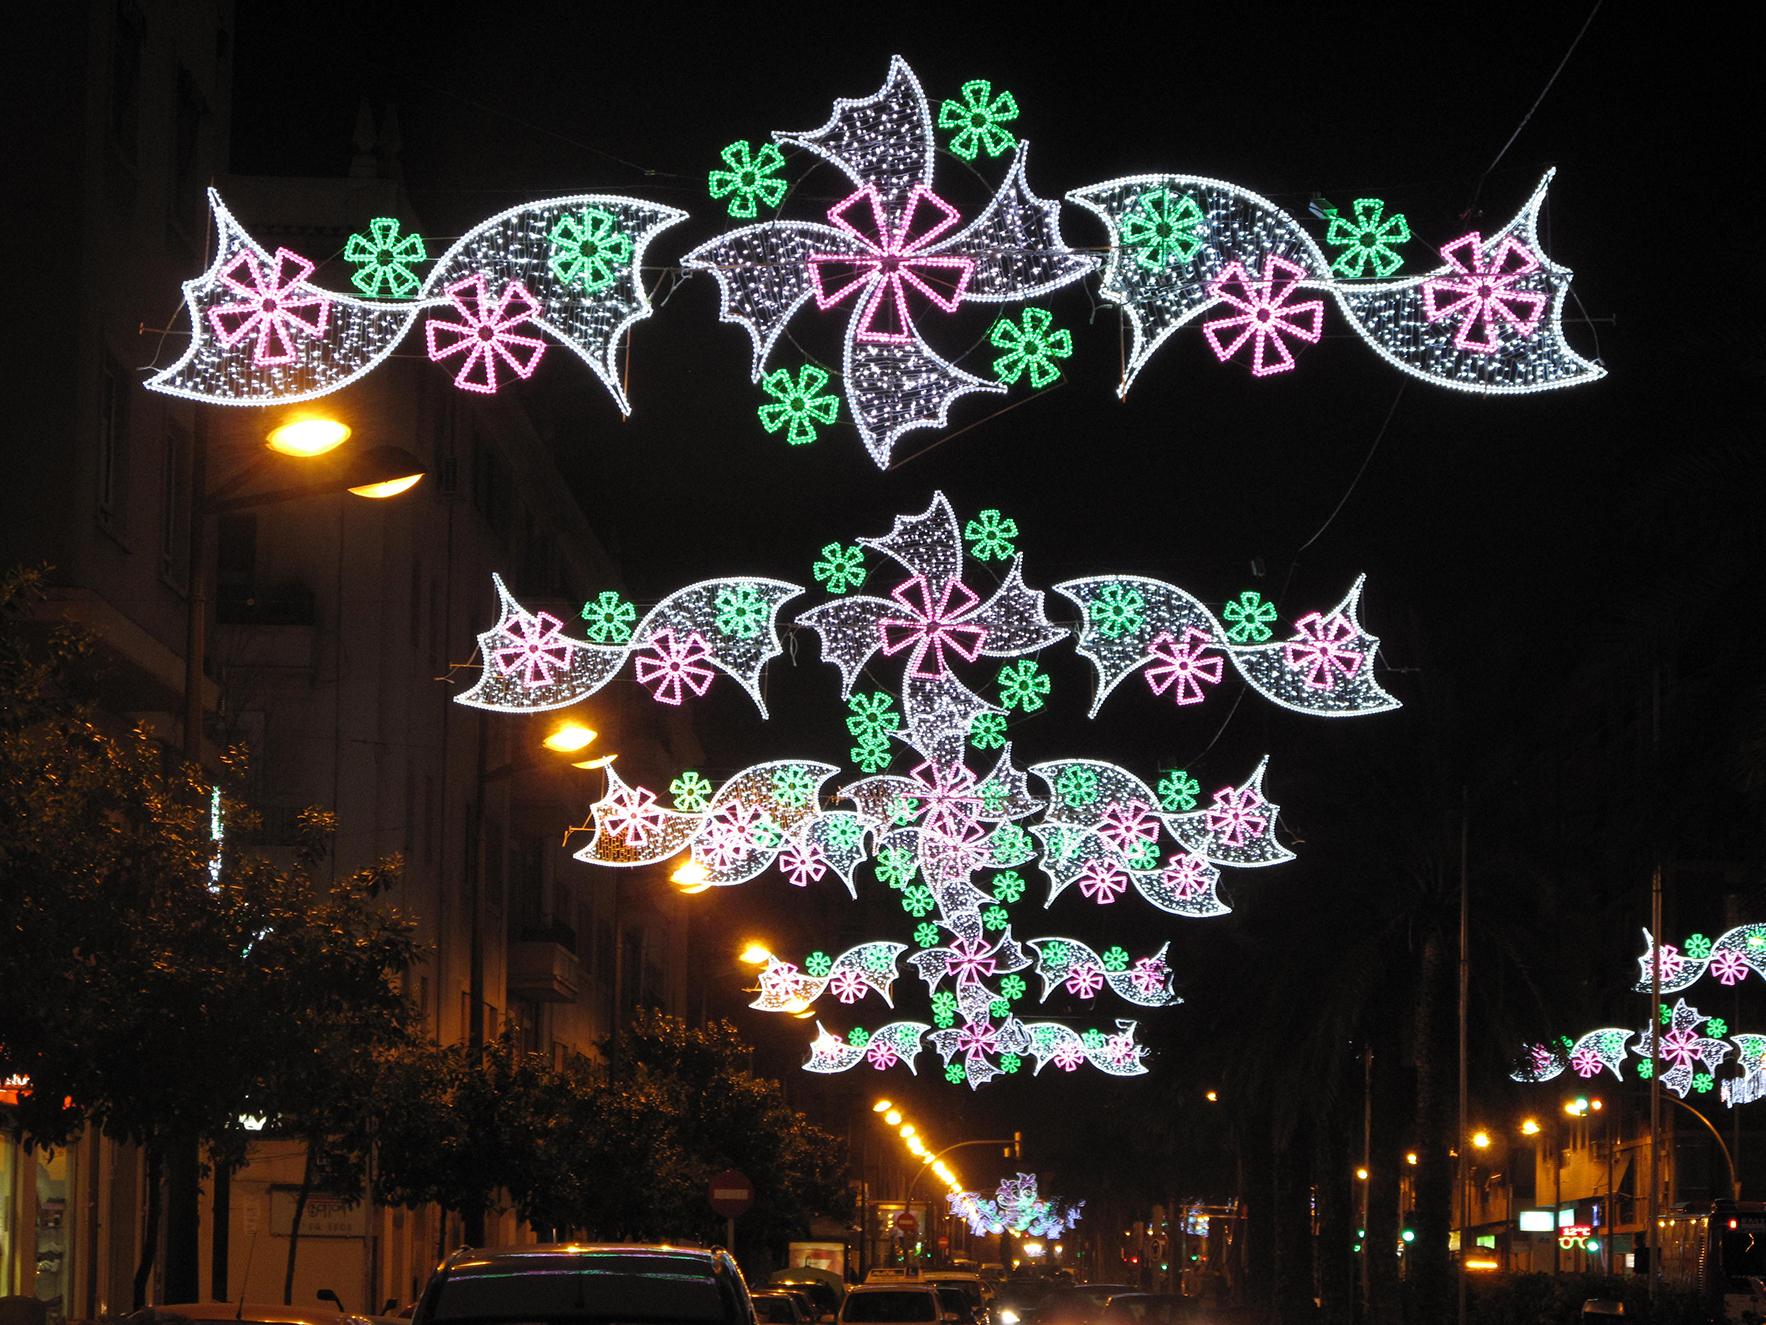 Elecfes Iluminaciones Fiesta 14